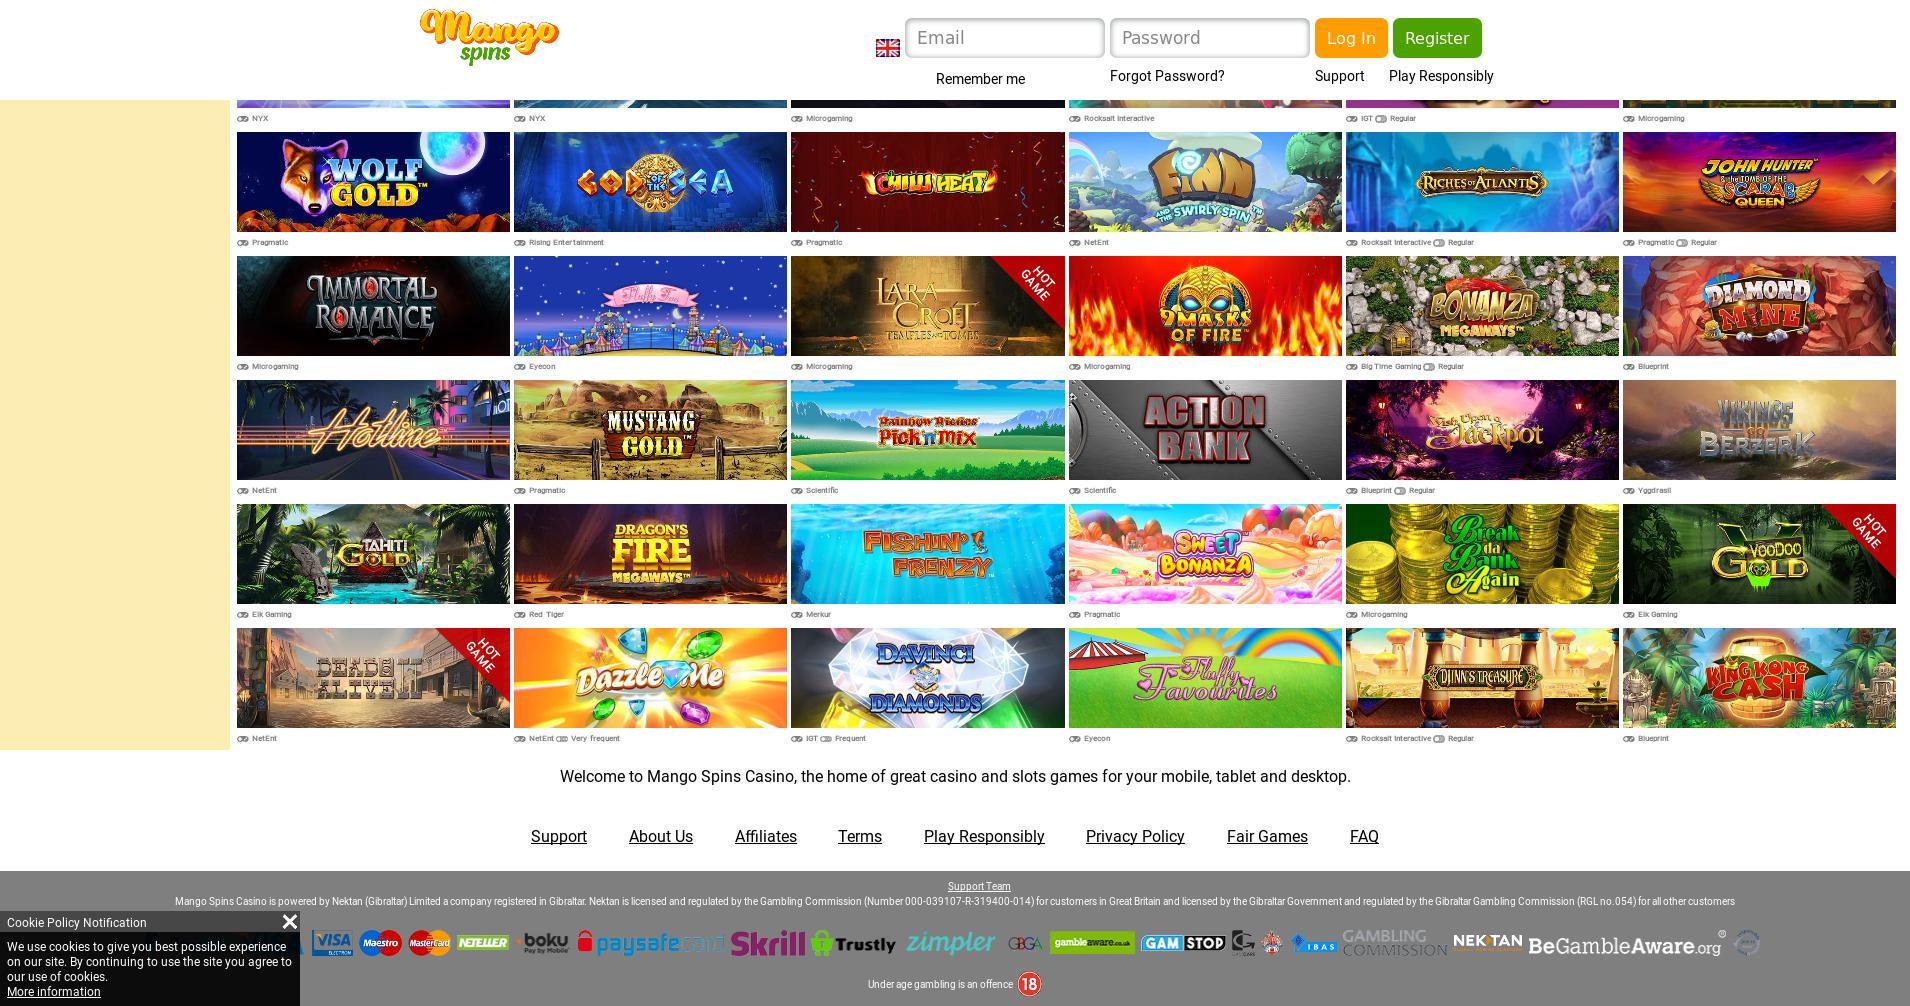 Casino screen Lobby 2019-11-19 for United Kingdom